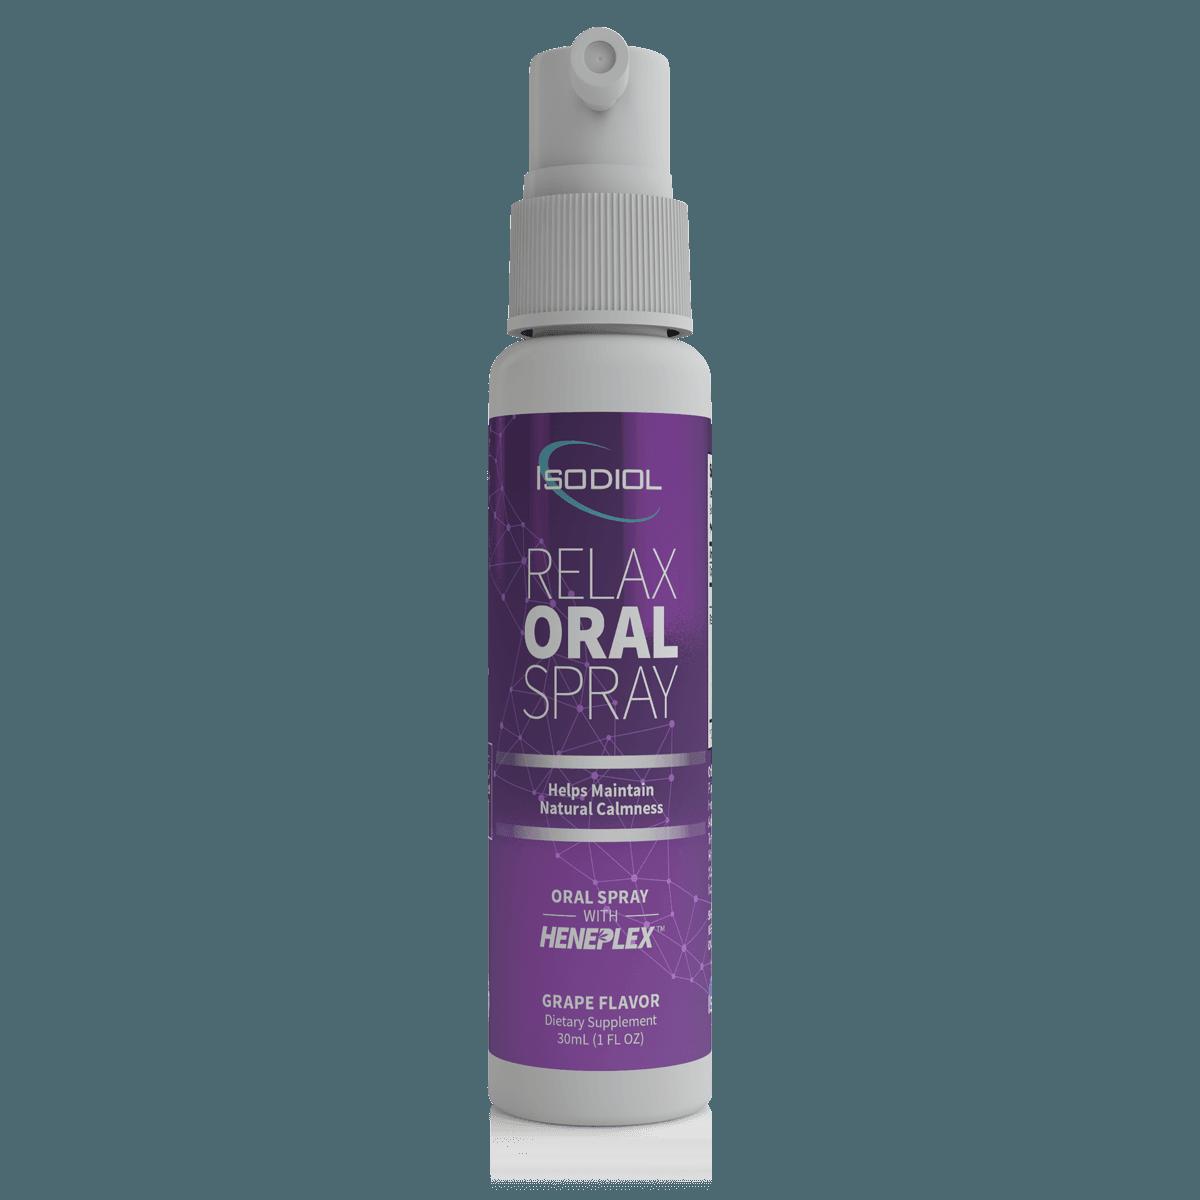 Relax Oral Spray